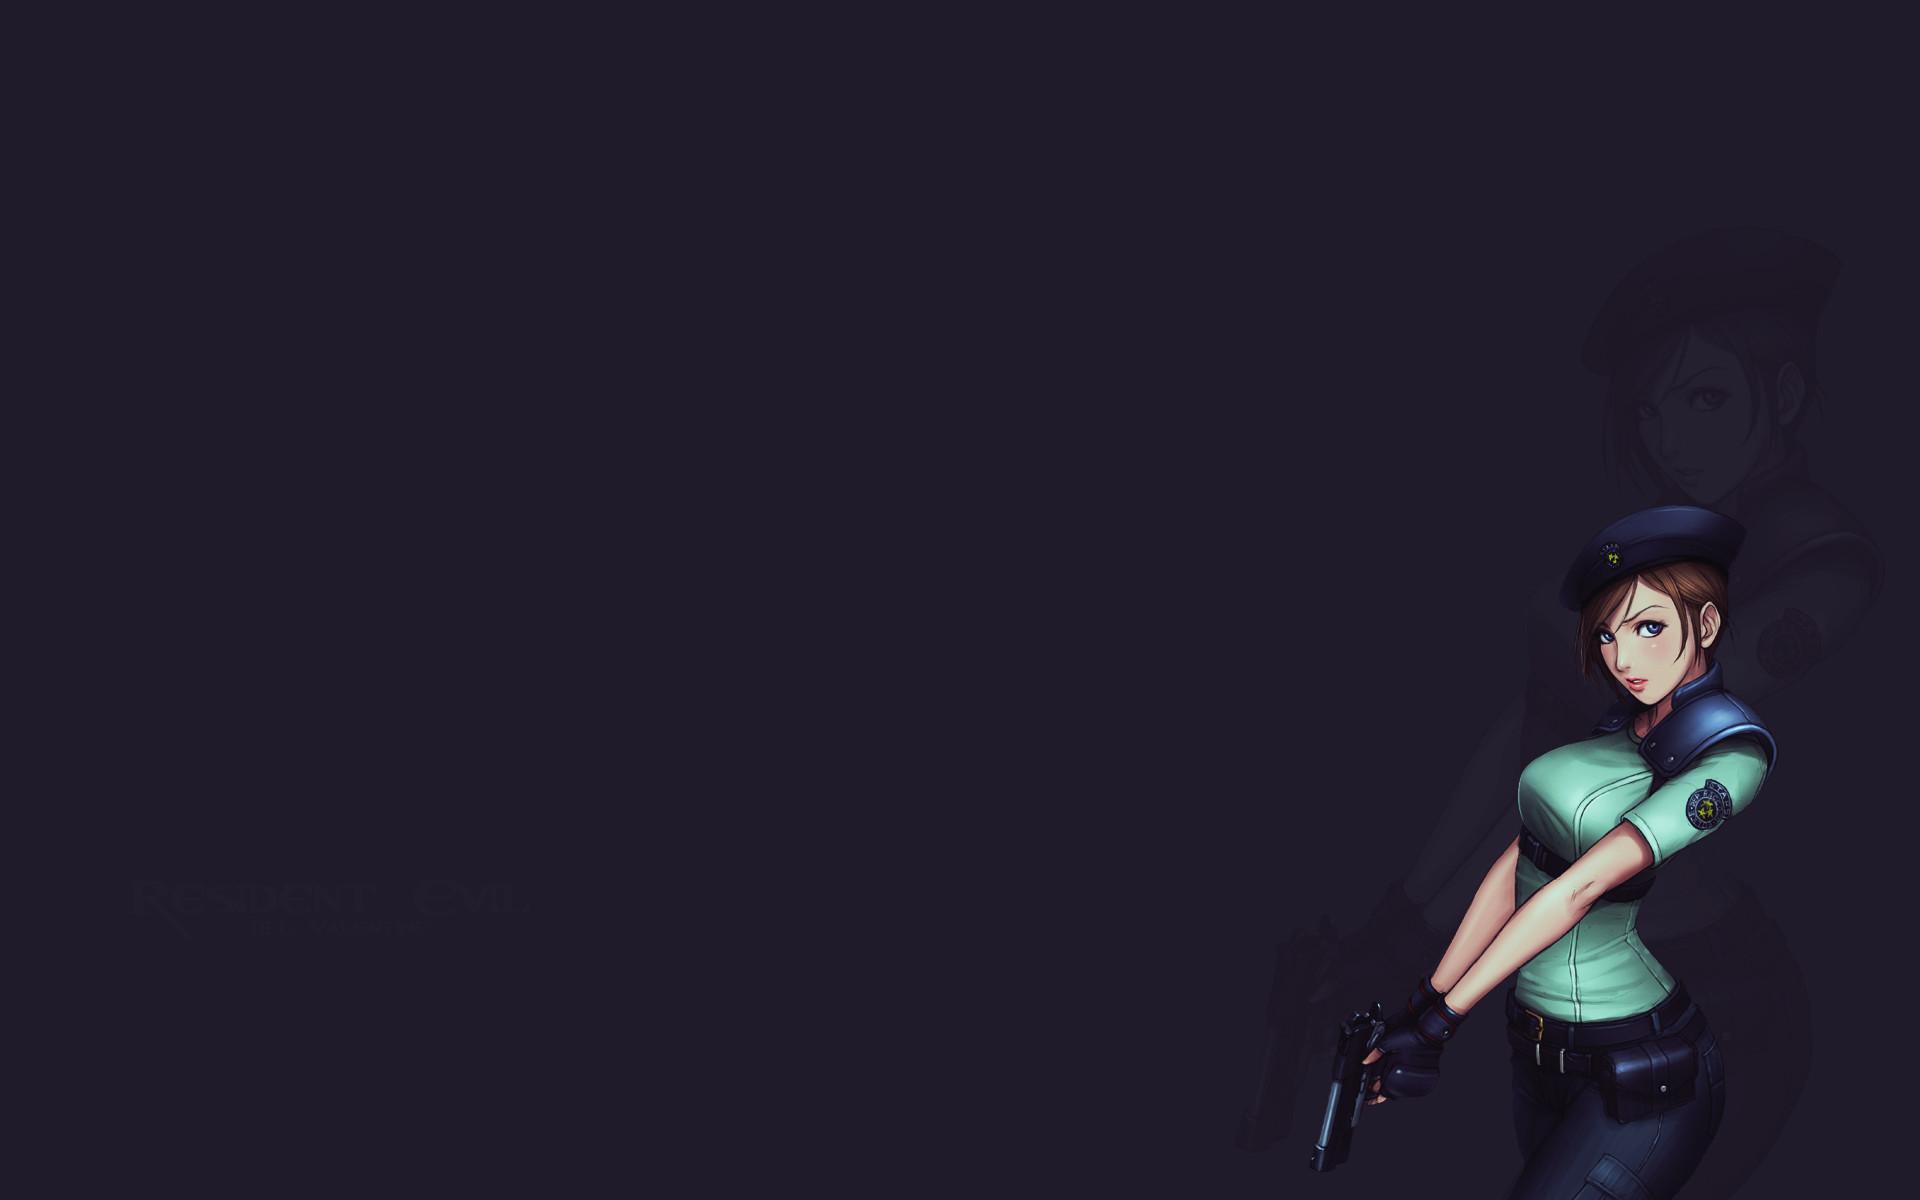 Resident Evil Jill Valentine artwork wallpaper | | 214107 |  WallpaperUP